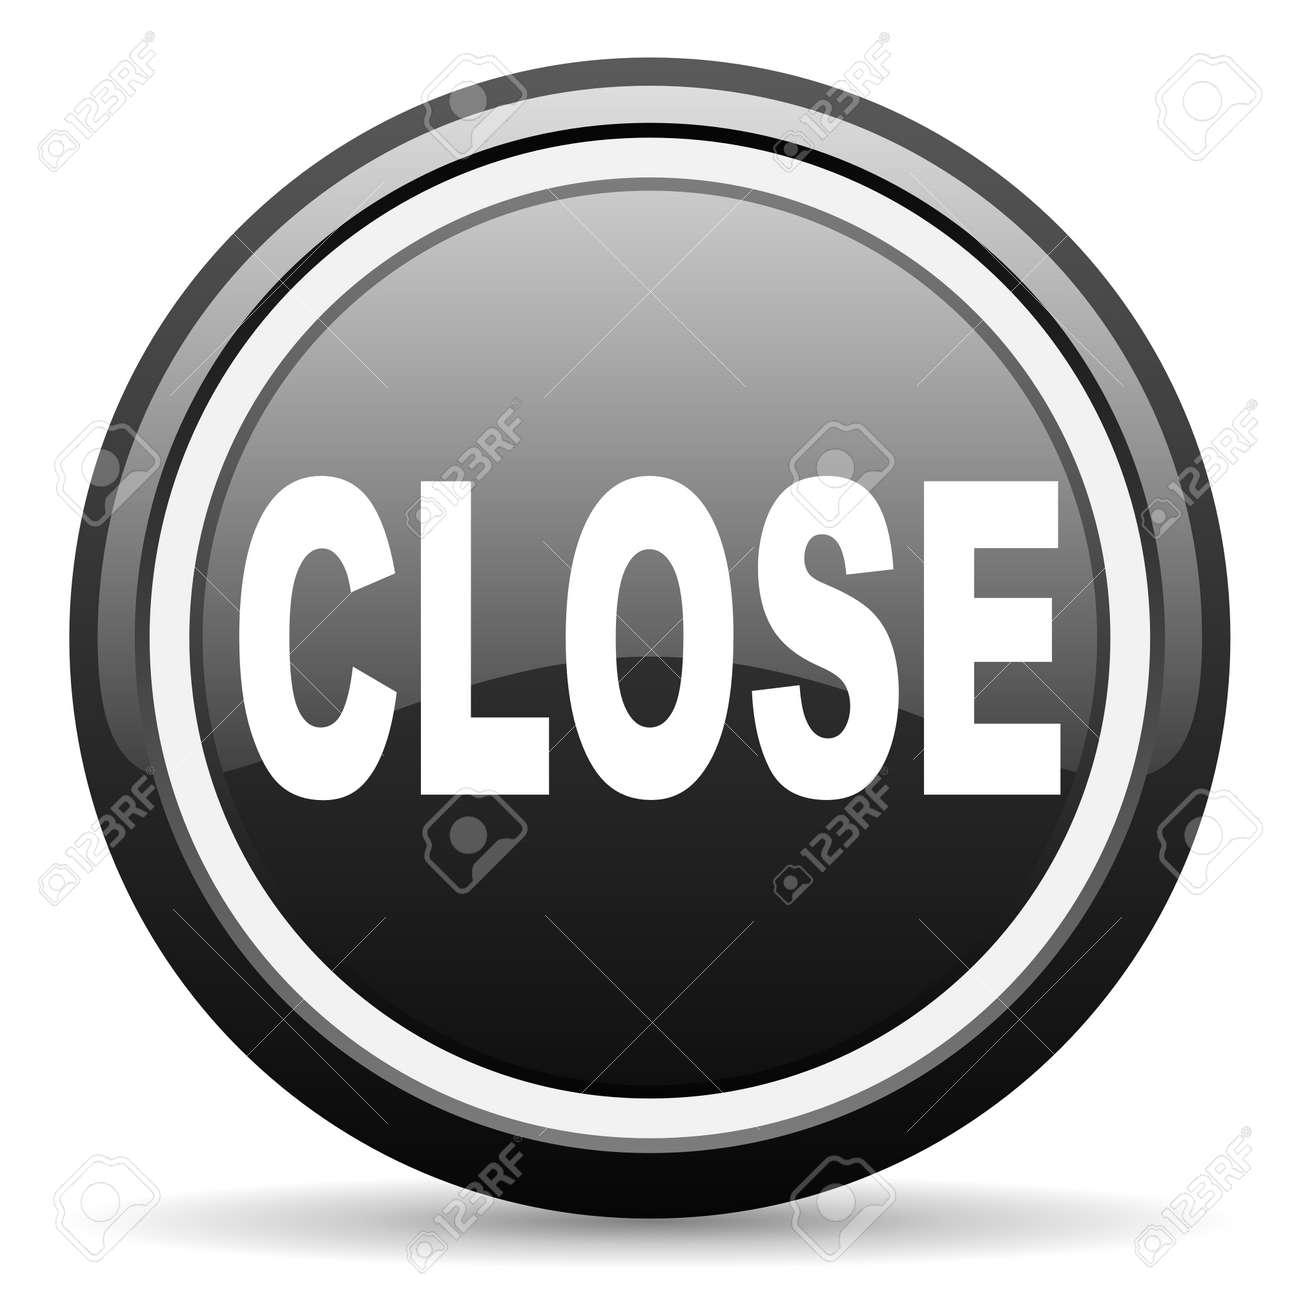 close black glossy icon on white background Stock Photo - 17087330